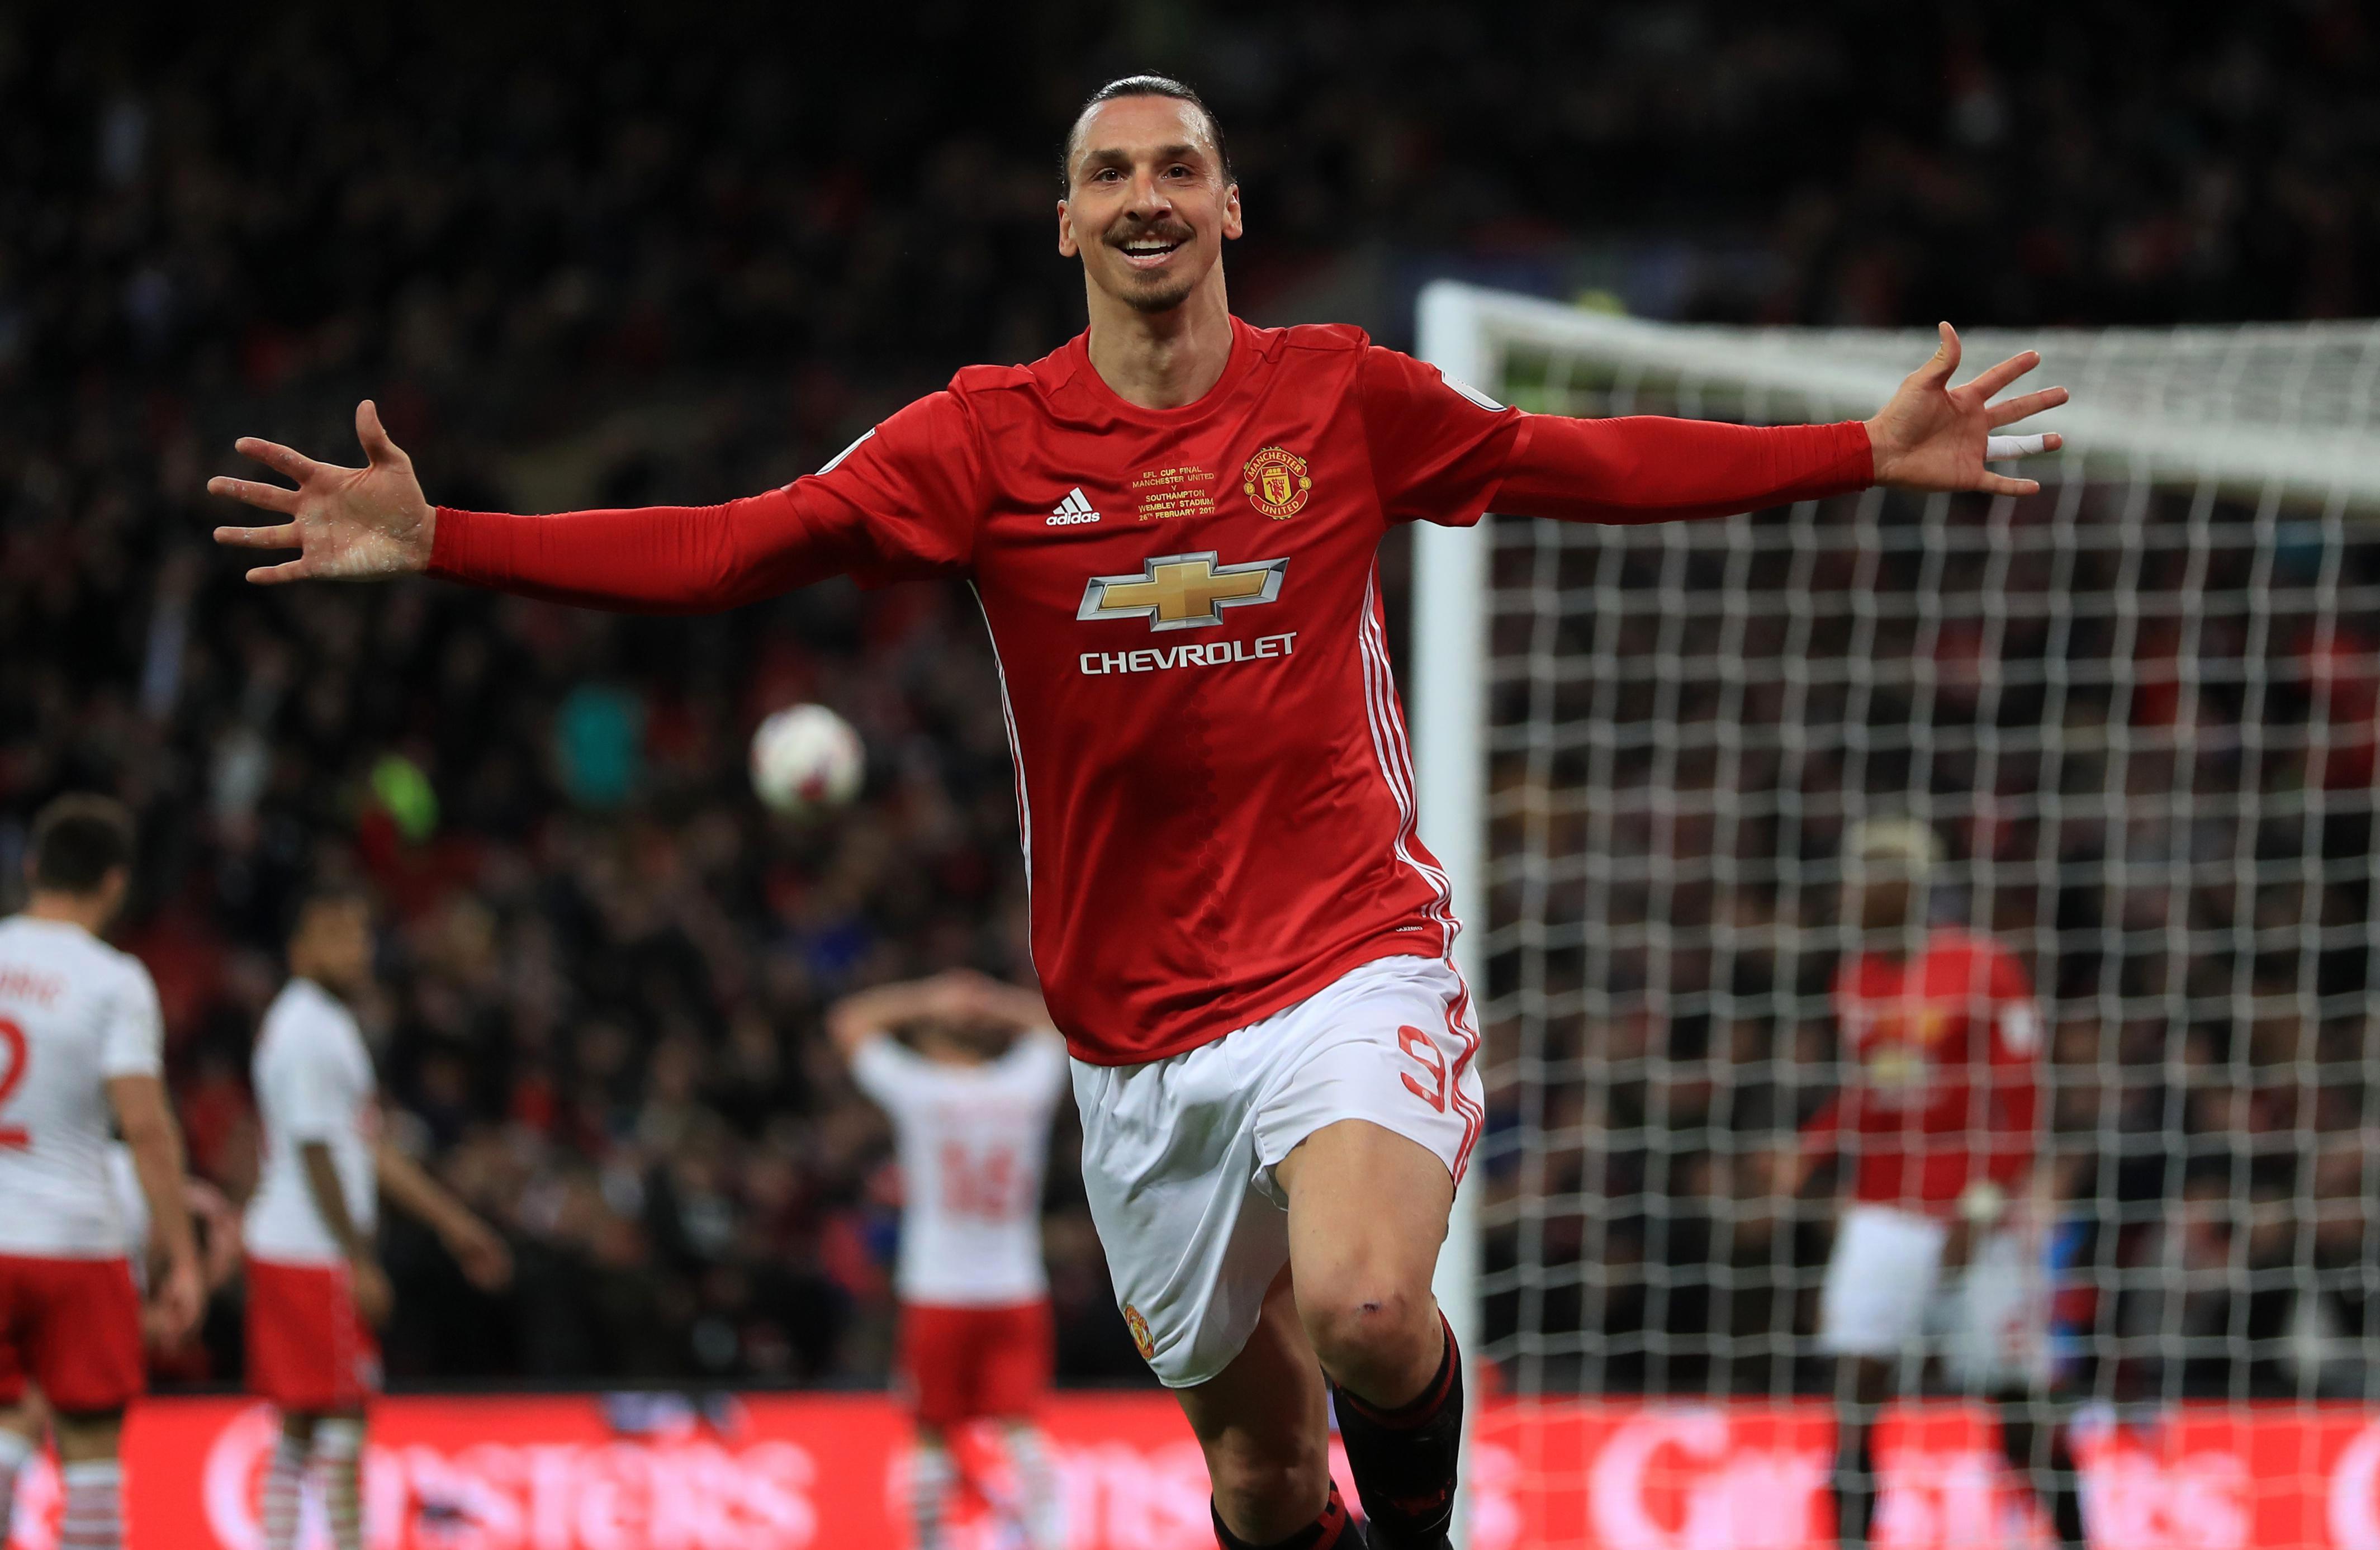 Zlatan Ibrahimovic celebrates winning goal in EFL Cup final